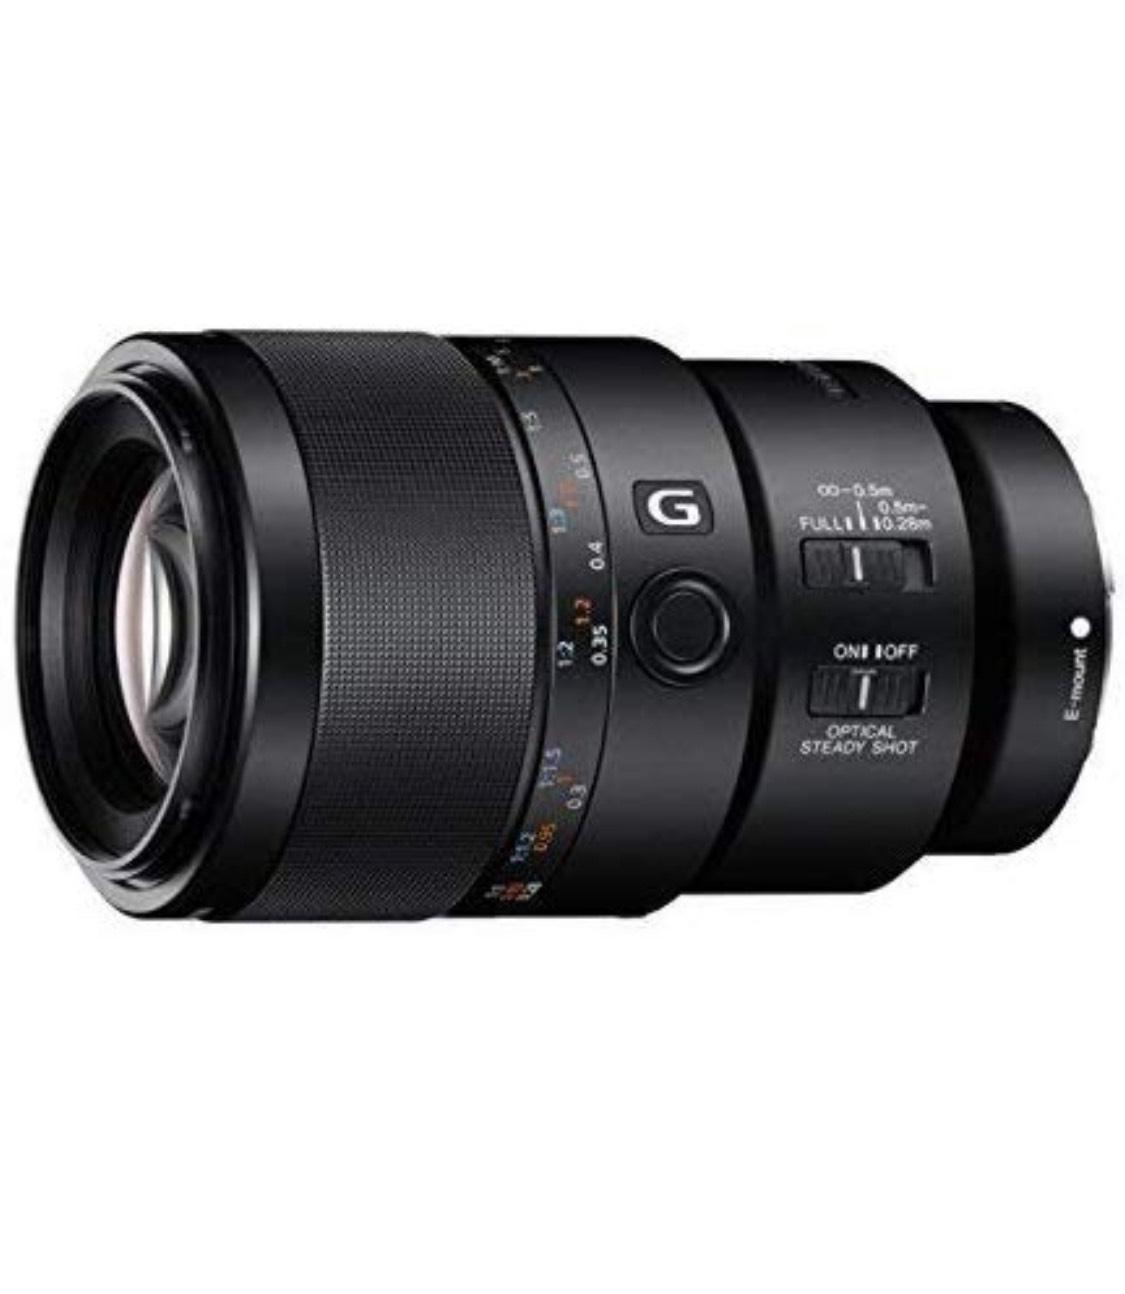 Sony 90mm f2.8 Macro G OSS Amazon.it